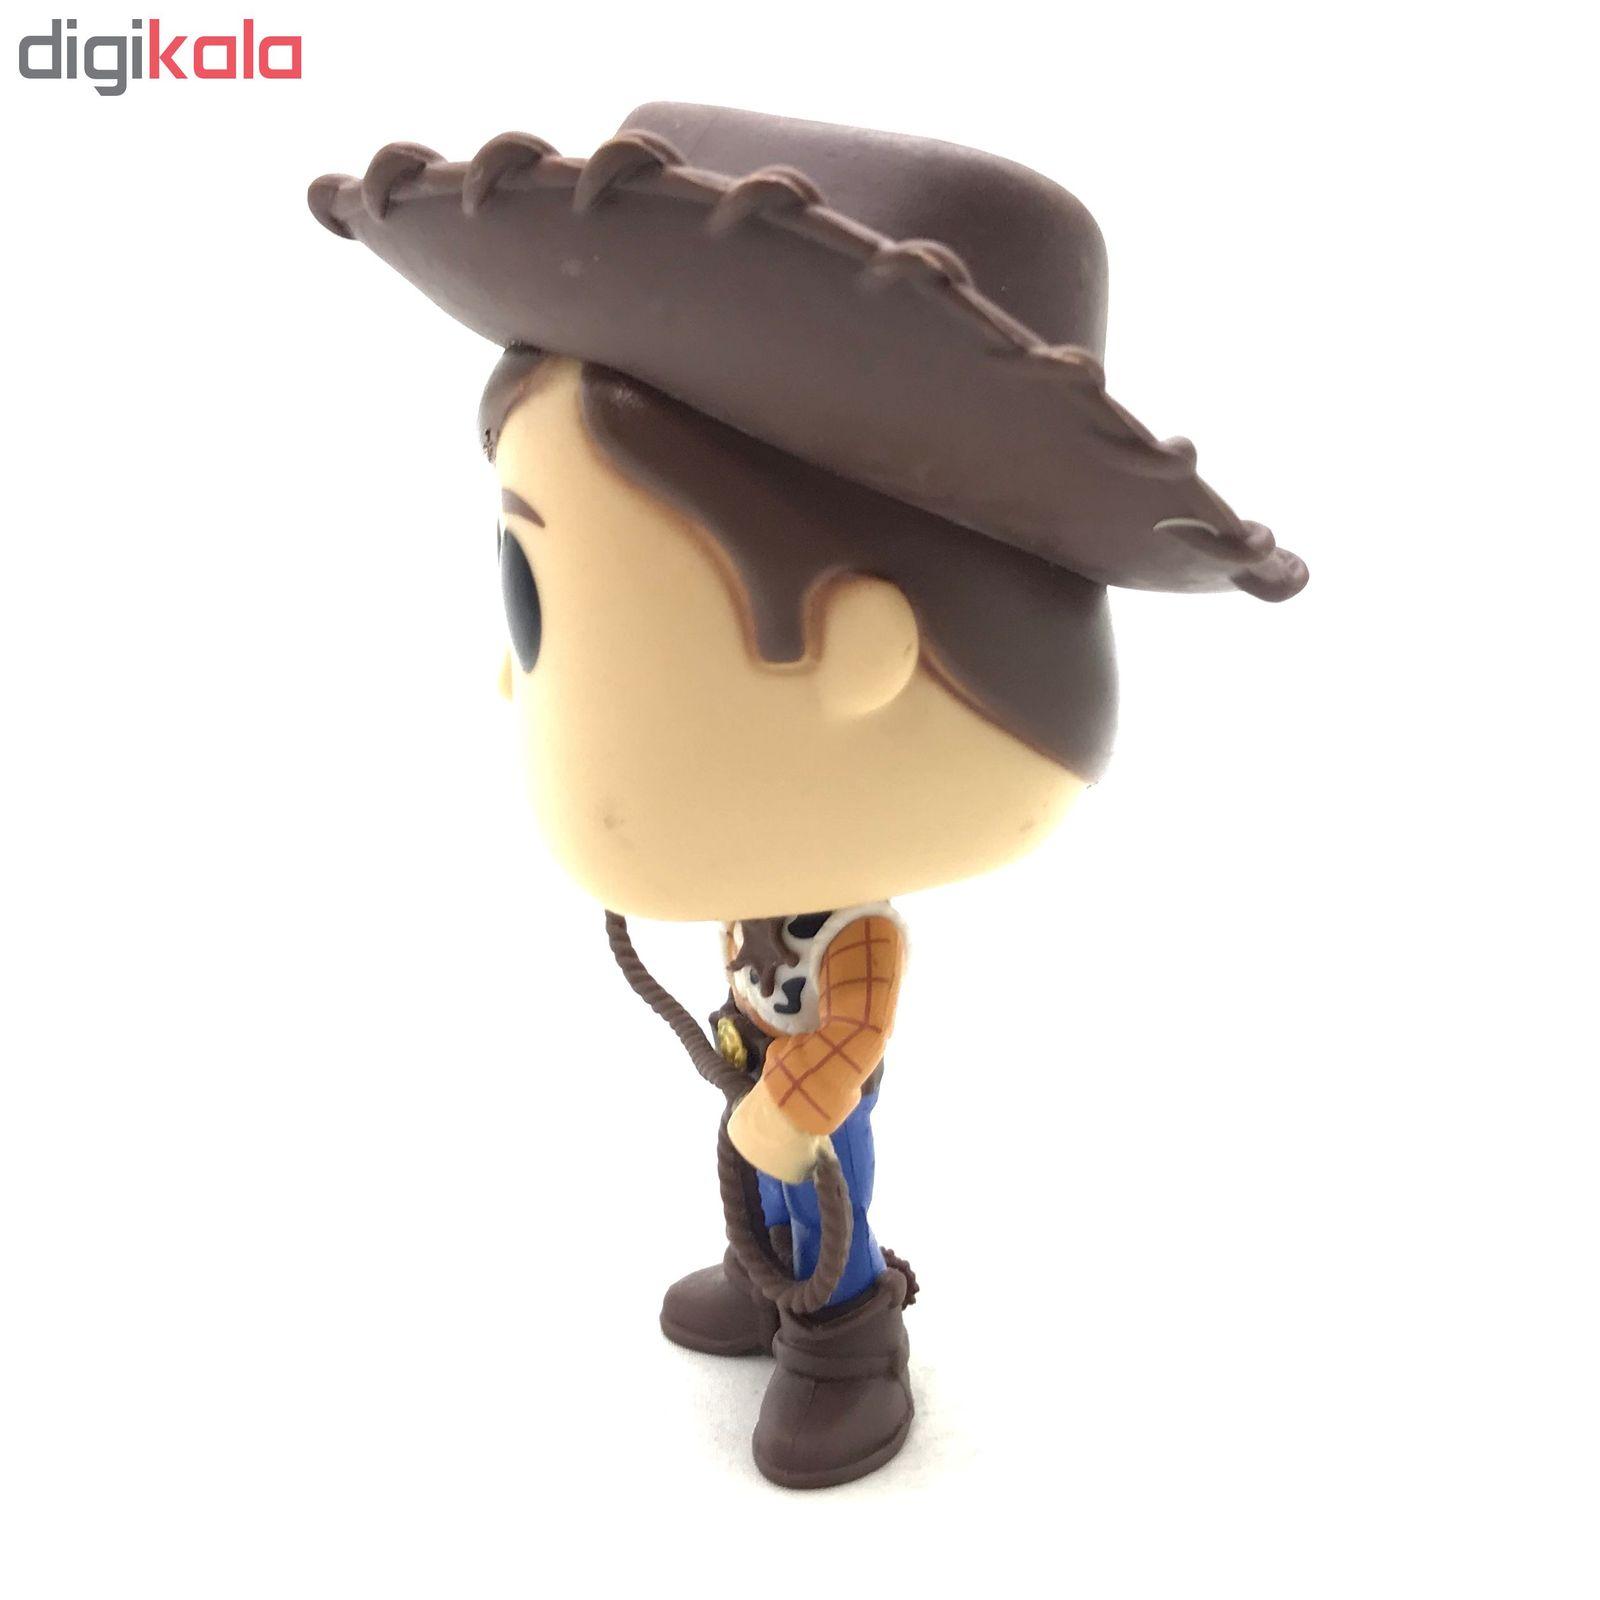 فیگور طرح Funko Pop Woody کد 62